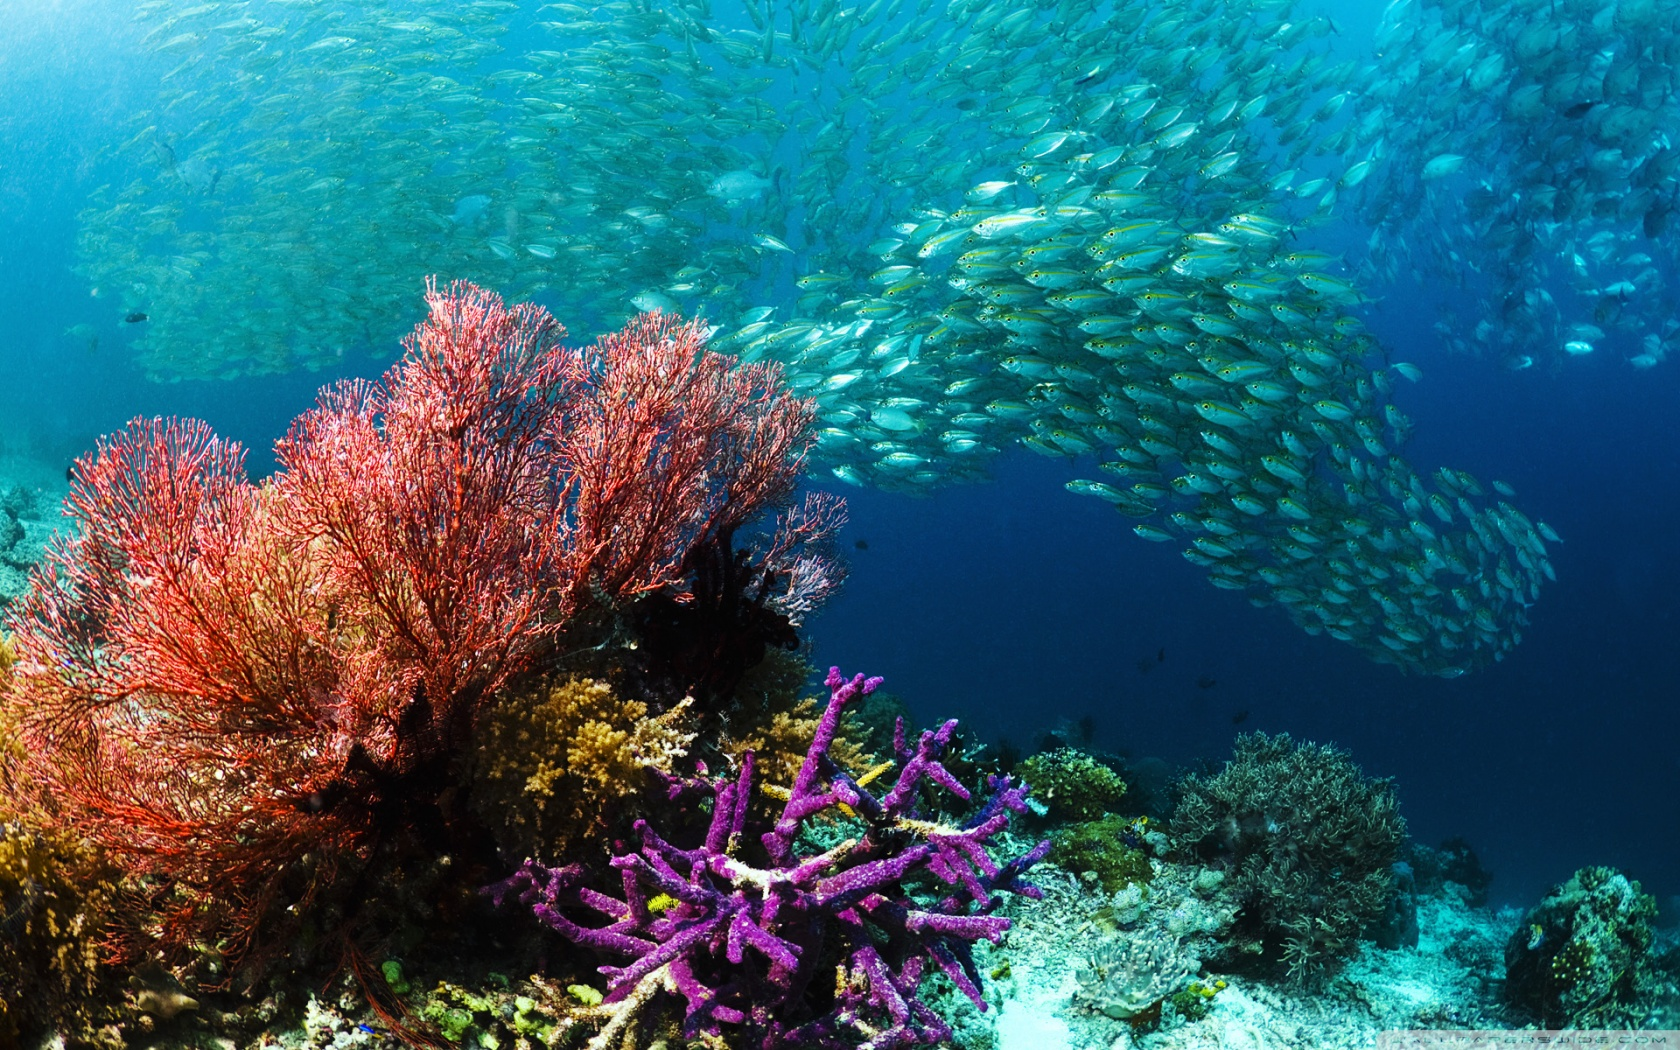 school_of_tropical_fish-wallpaper-1680×1050